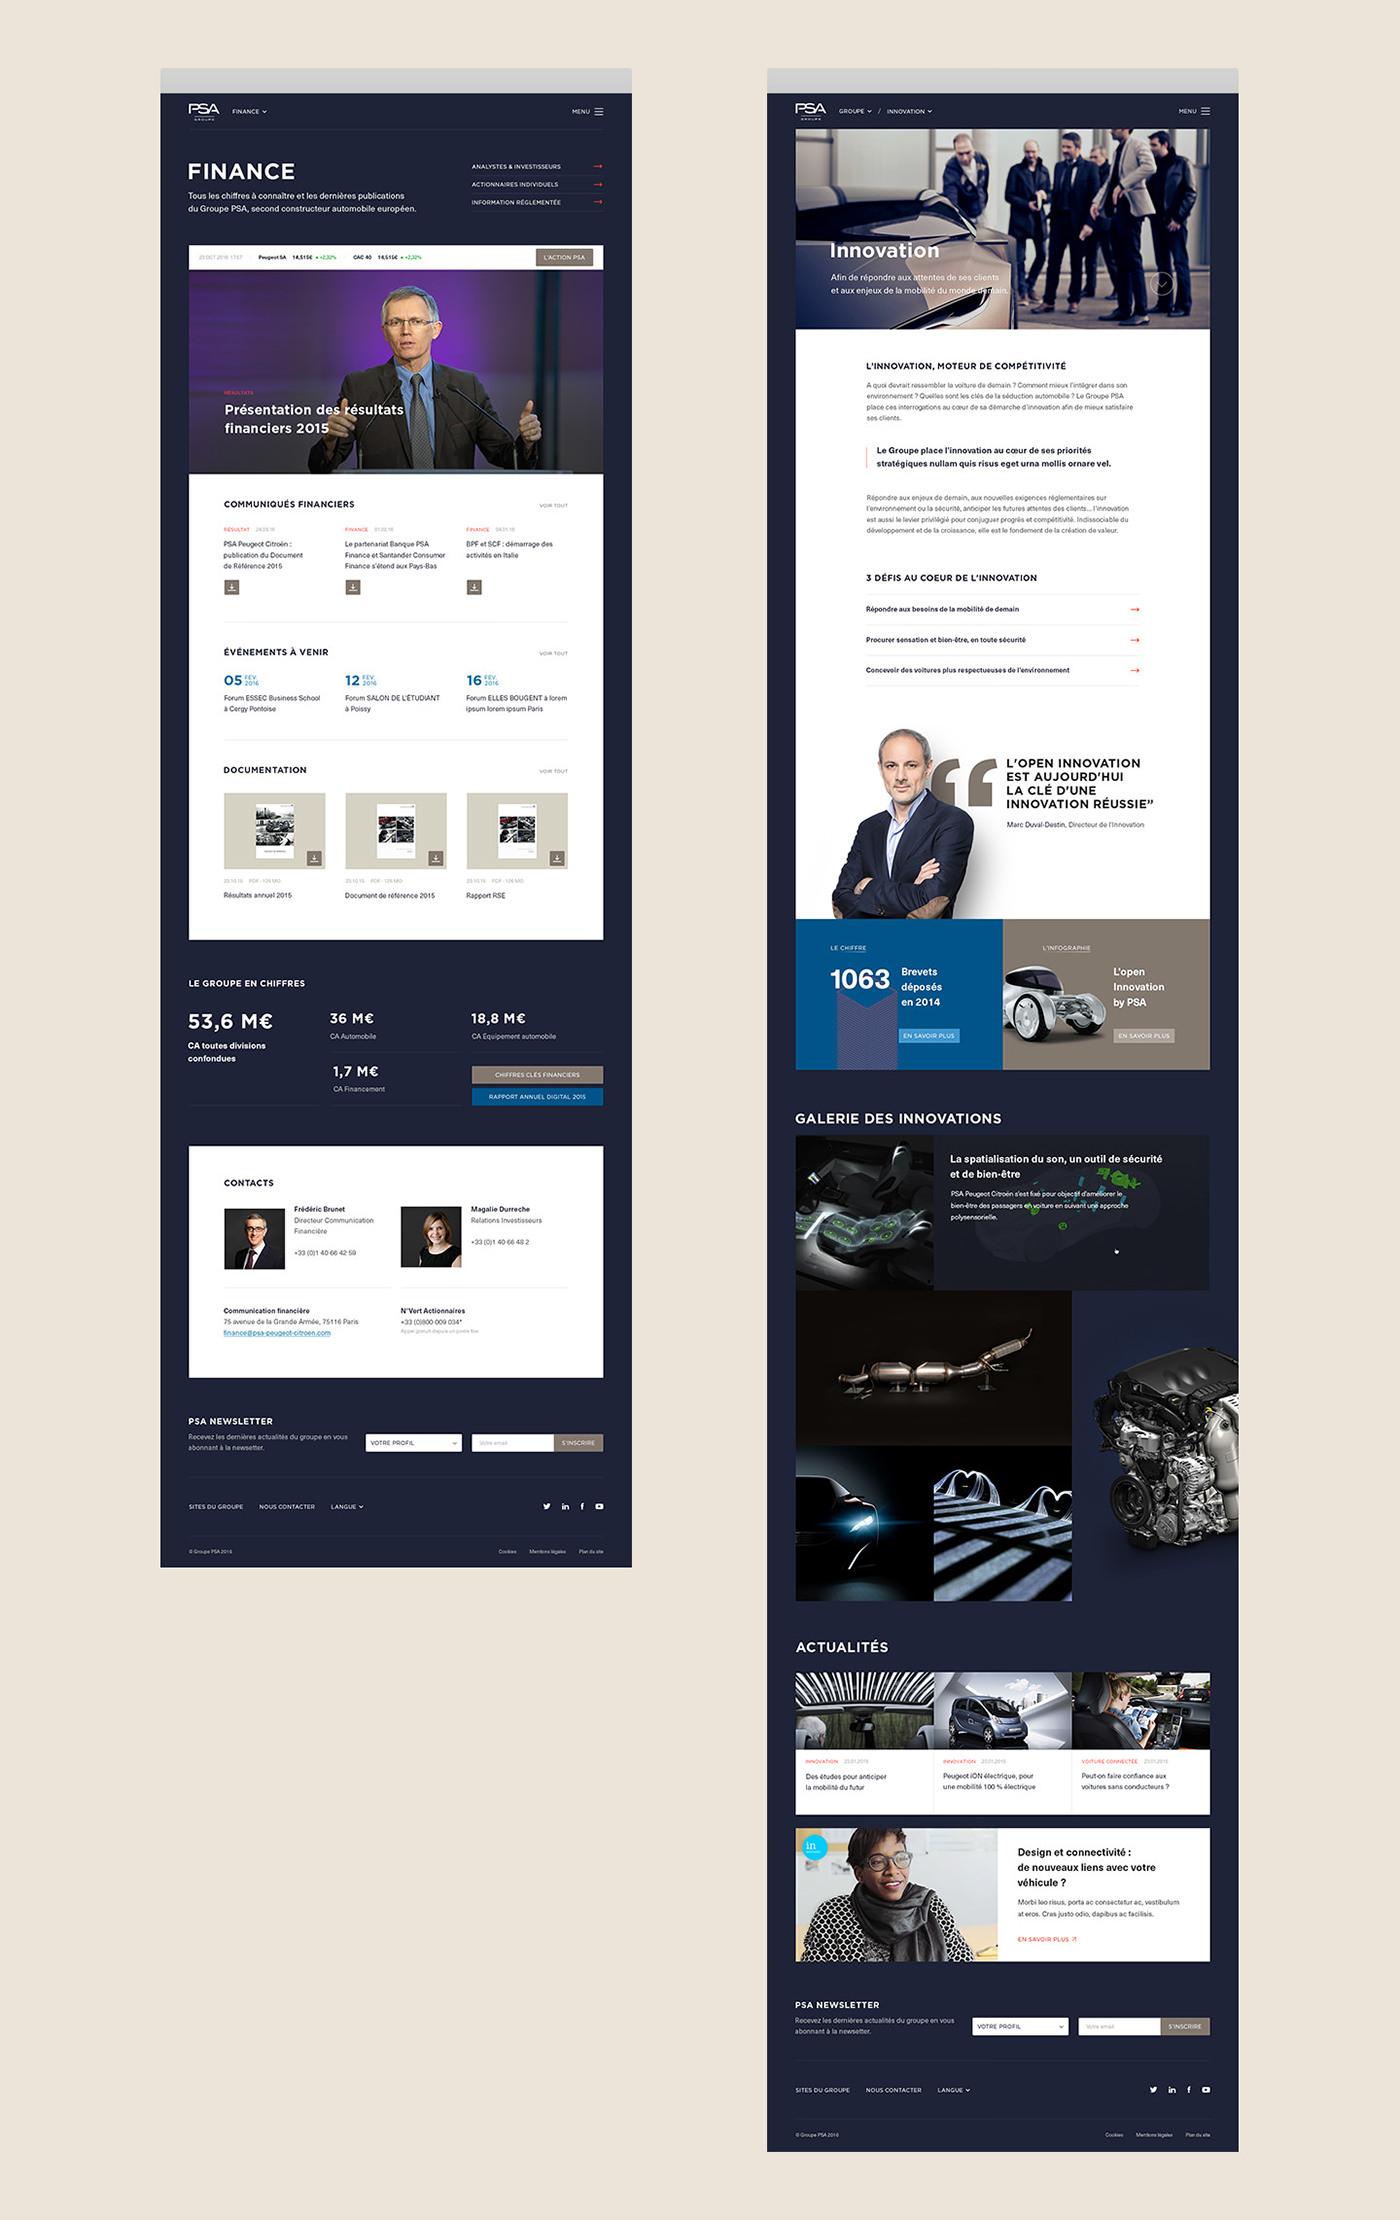 automotive   car corporate citroen PEUGEOT DS industry branding  finance Motoring